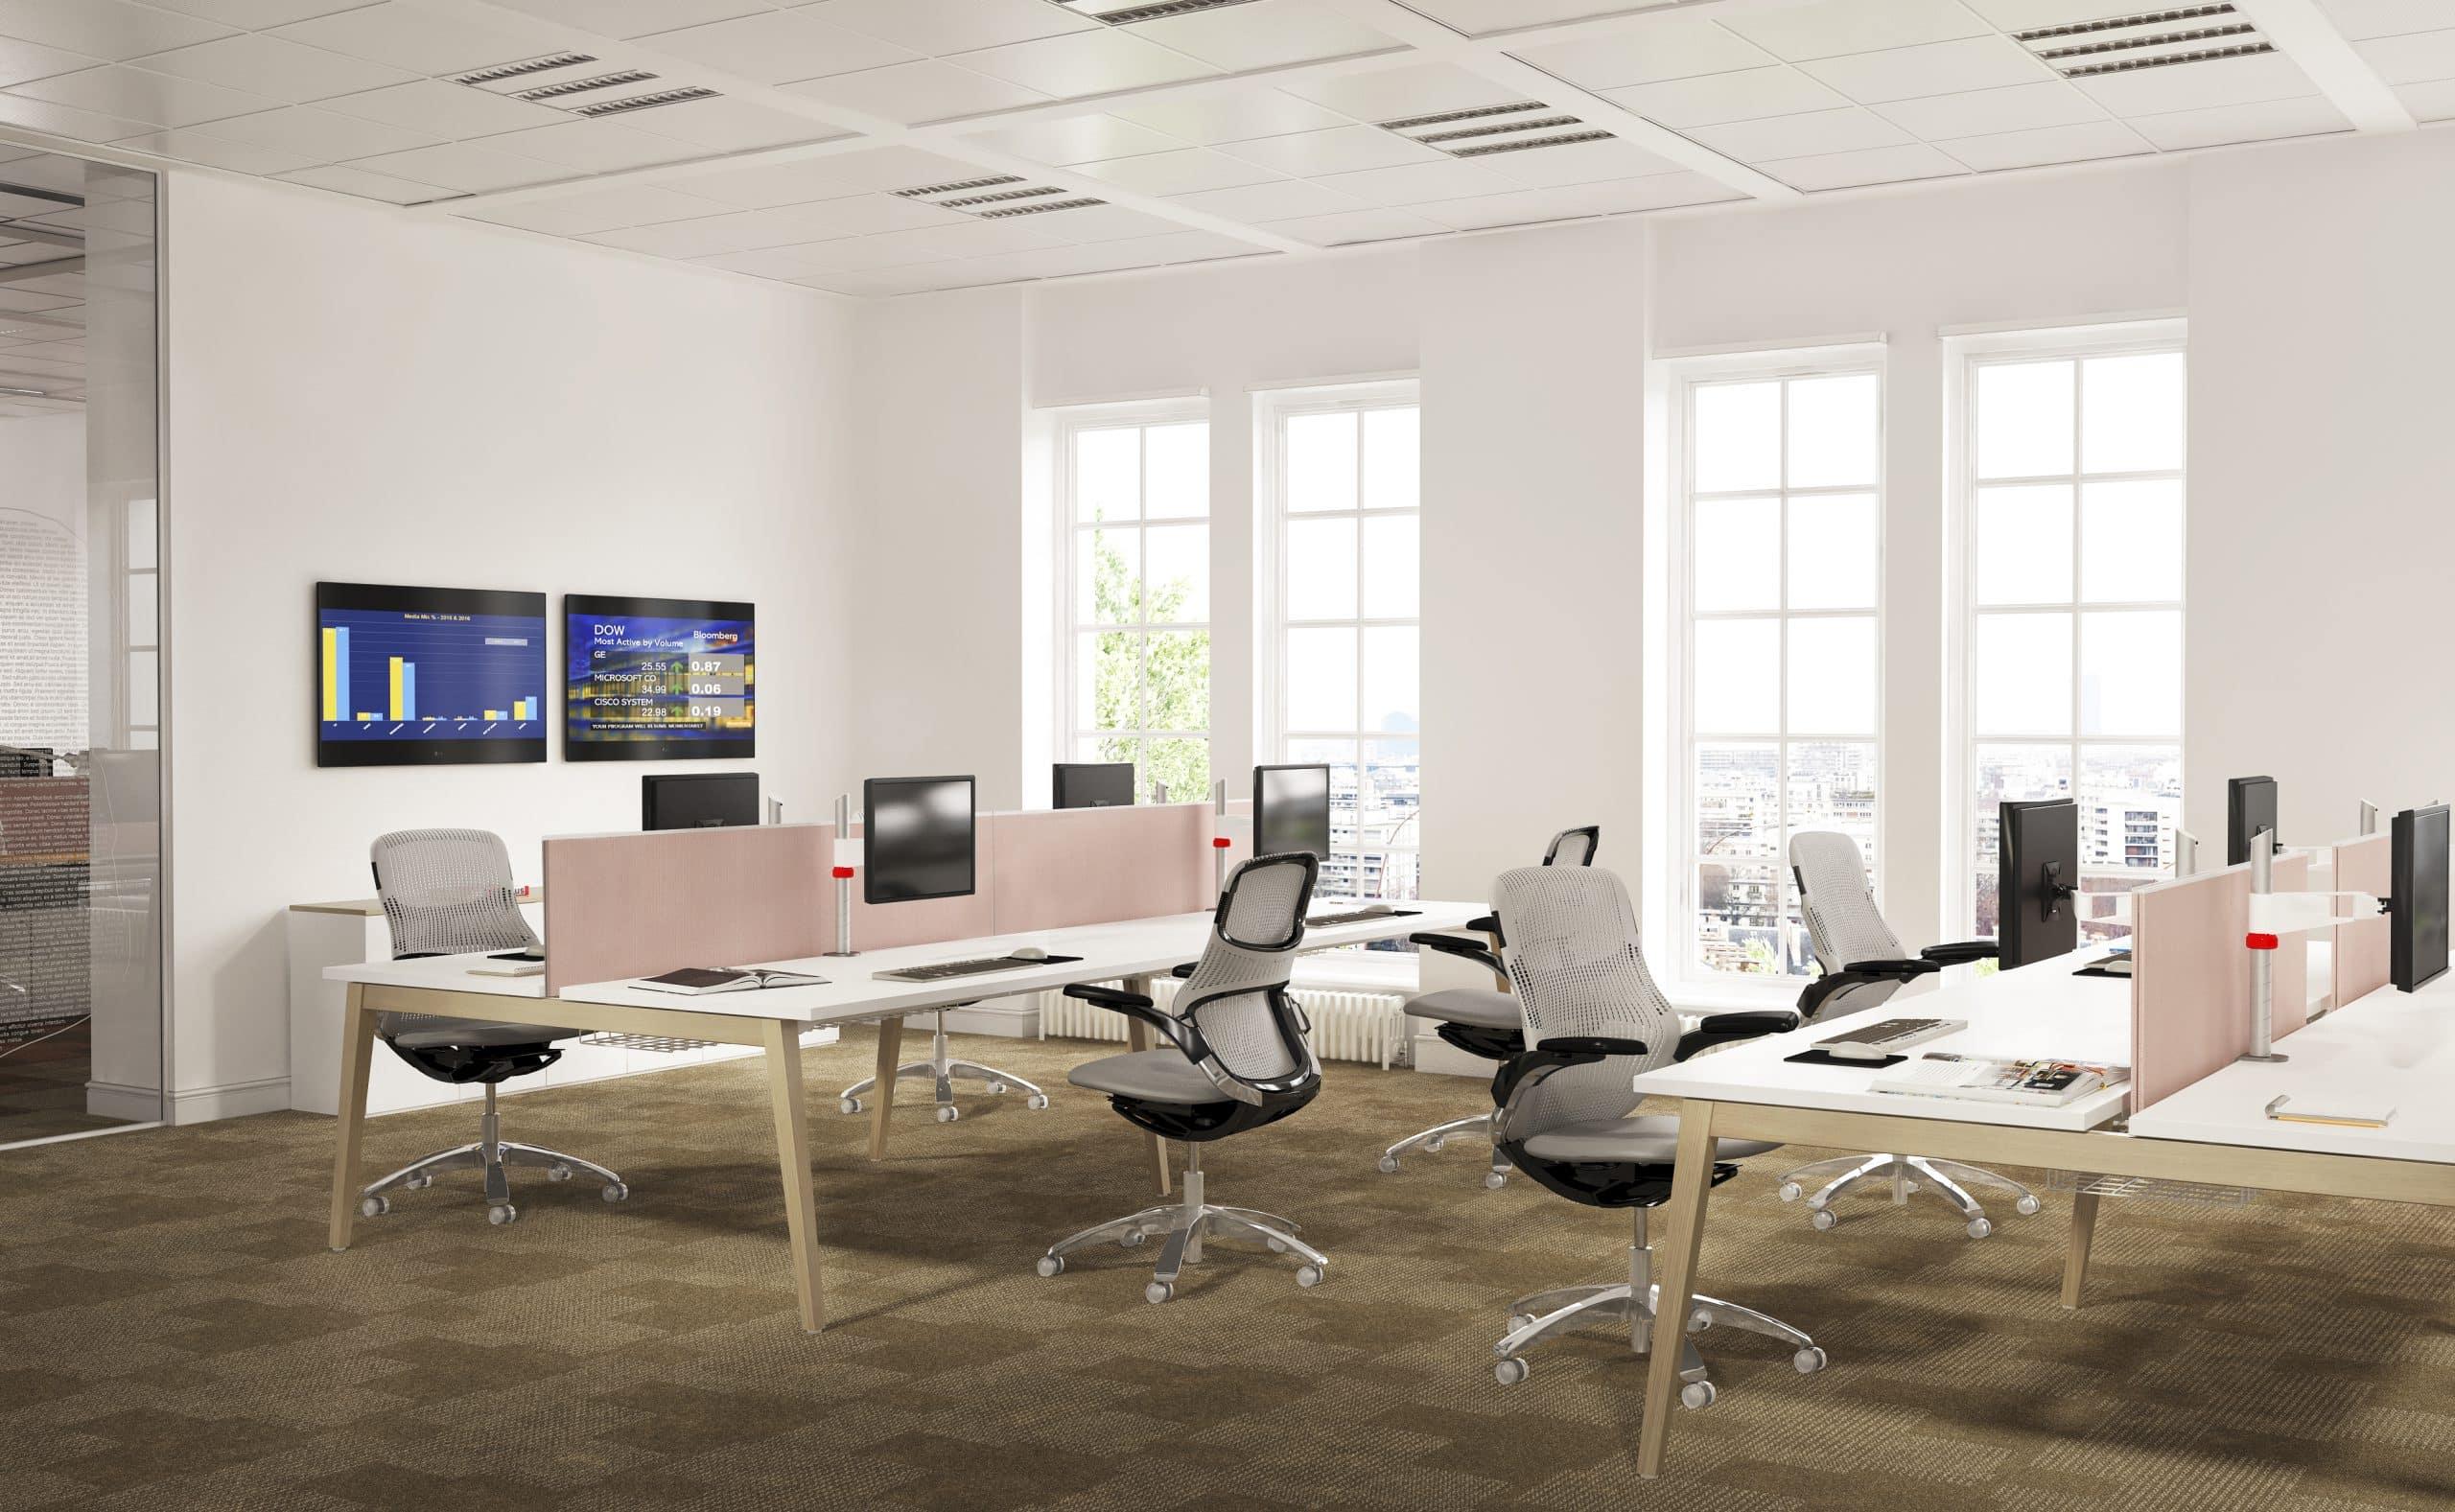 workbench-kantoormeubilair-Scope-Knoll-ENNAIR